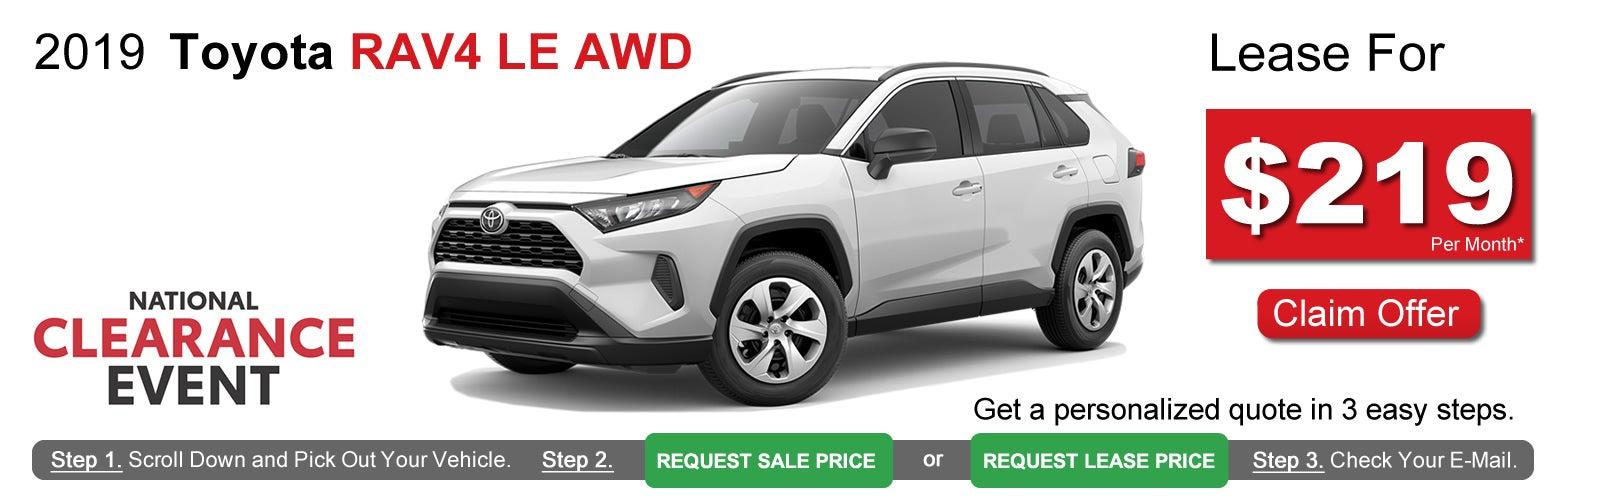 Toyota Lease Deals >> Toyota Rav4 Lease Deals Near Boston Ma Lease Offers